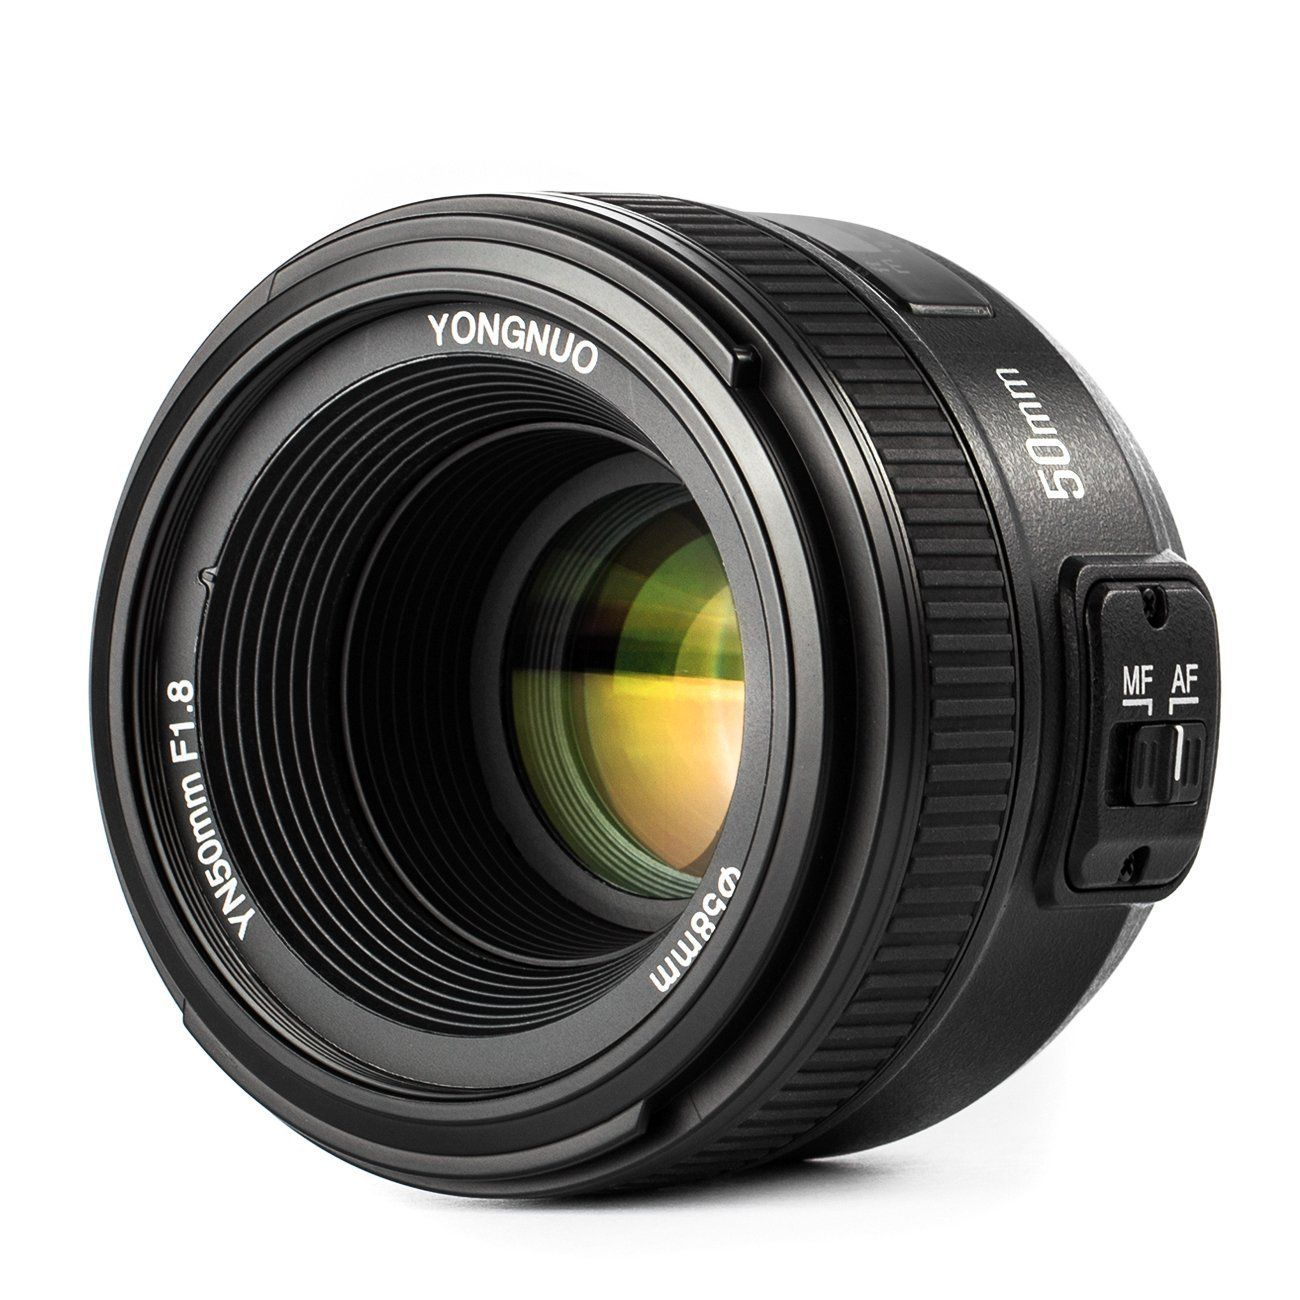 Yongnuo Objectif Yn 50 Mm F 18 Af Mf Pour Nikon Dslr Appareil Photo Meike 85mm F28 Macro Lens For